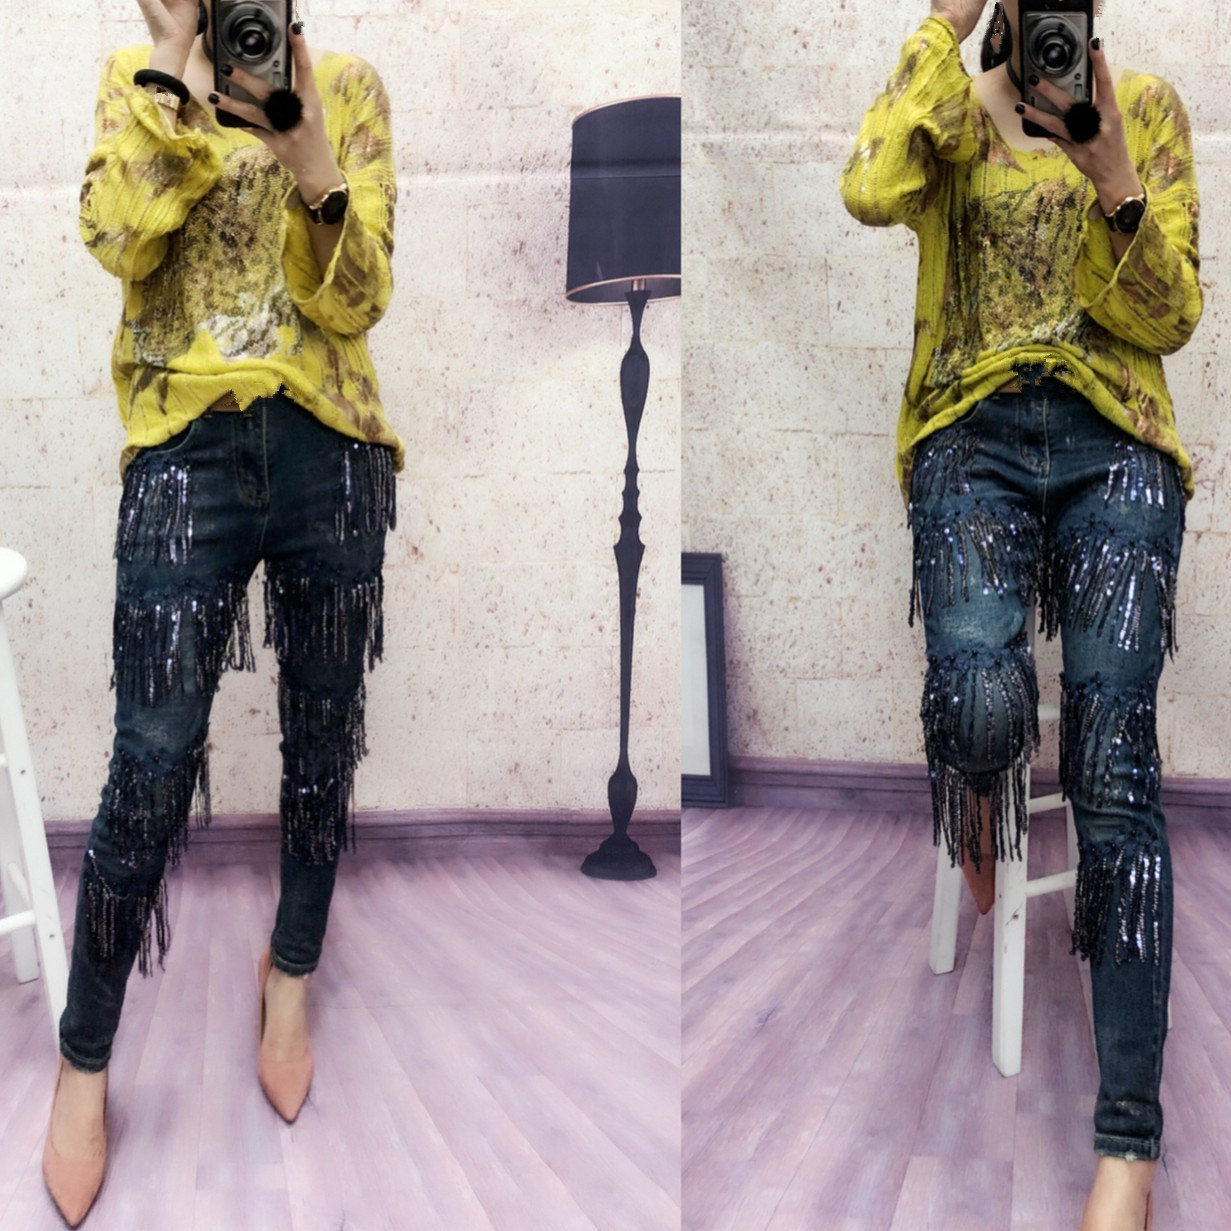 América Jeans Casual Lentejuelas Borla Cintura De Azul Europa Pantalones Moda Mujer Slim Lápiz Alta HfAAUdq